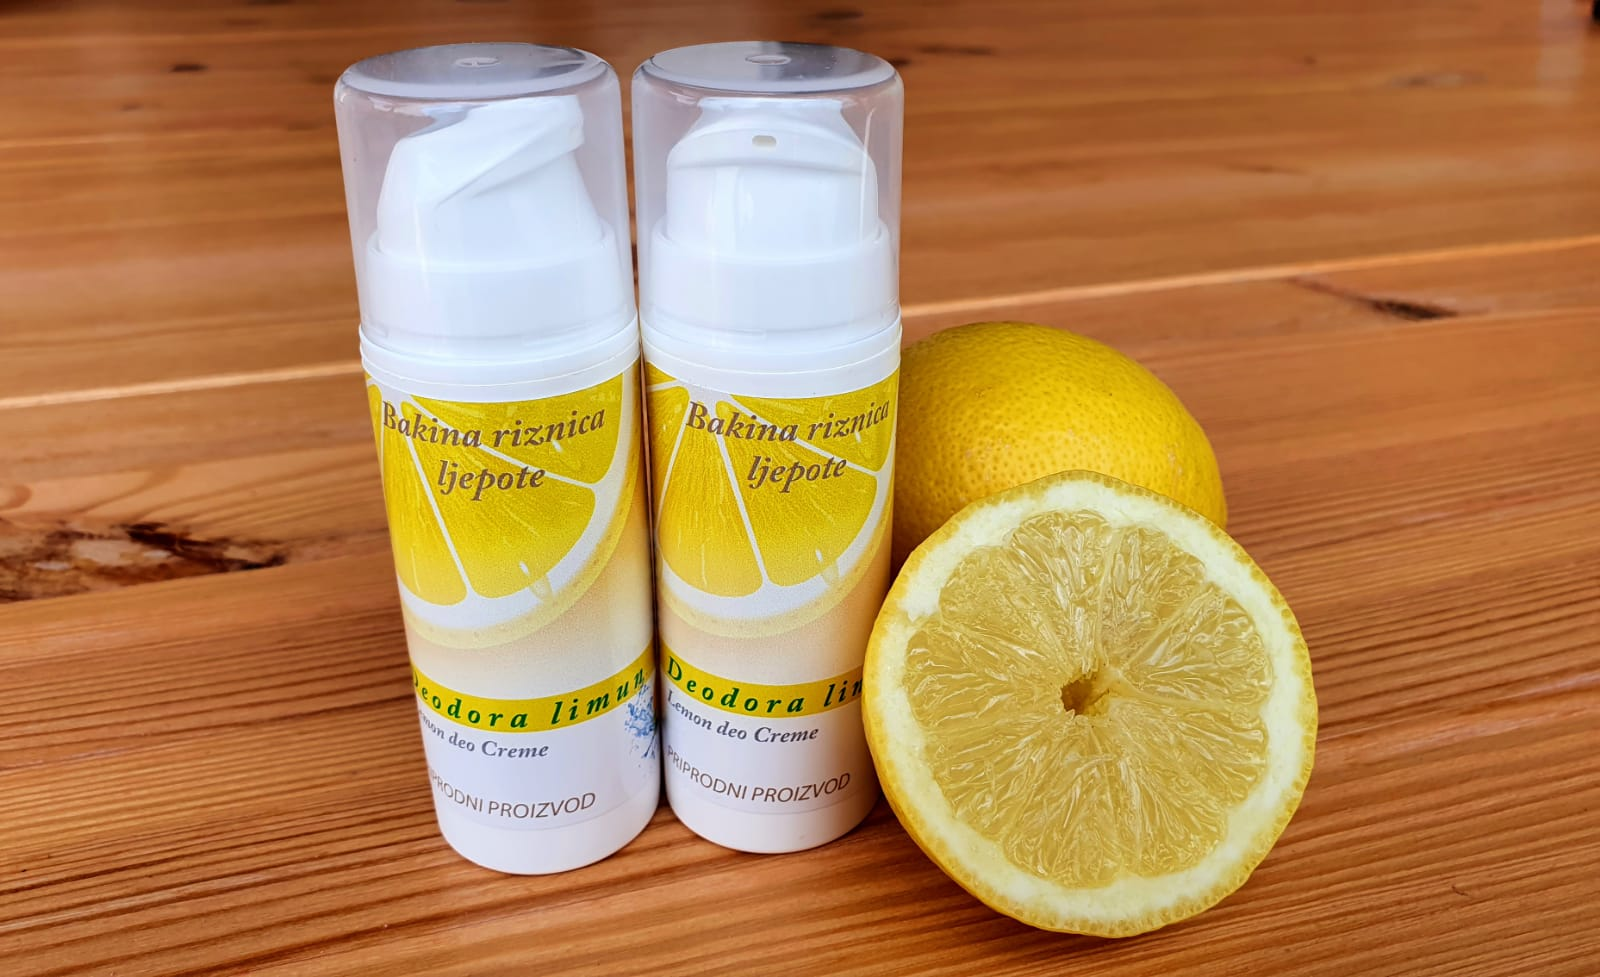 Deodora limun